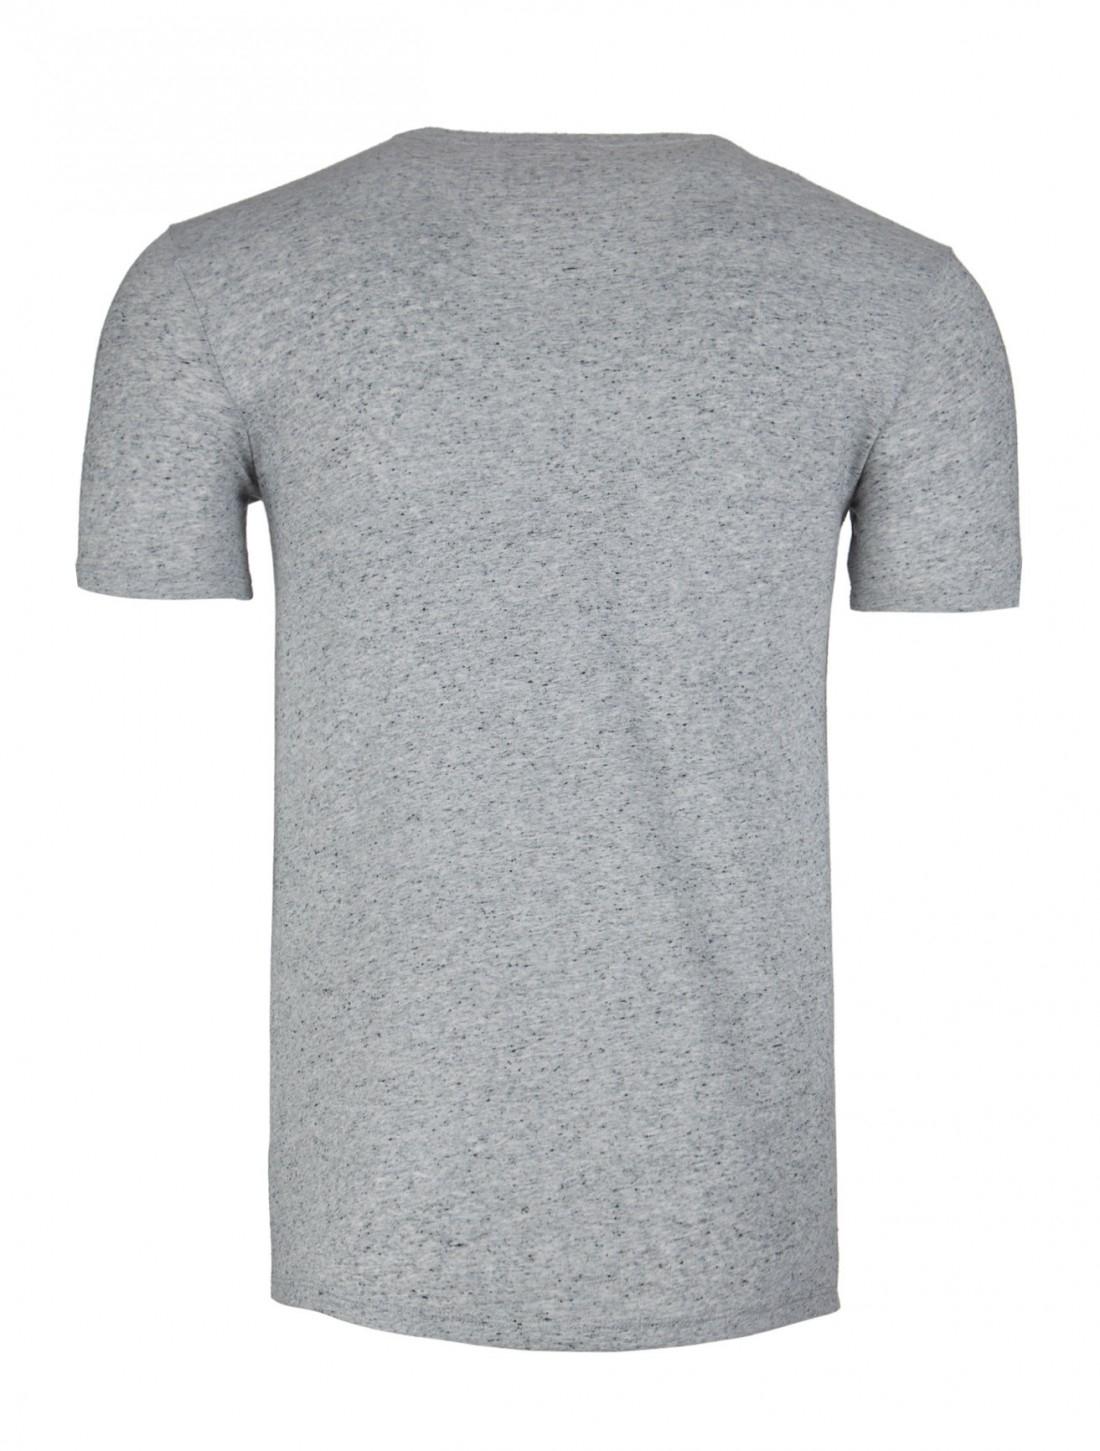 Atm heather pocket t shirt in gray for men heather grey Mens heather grey t shirt